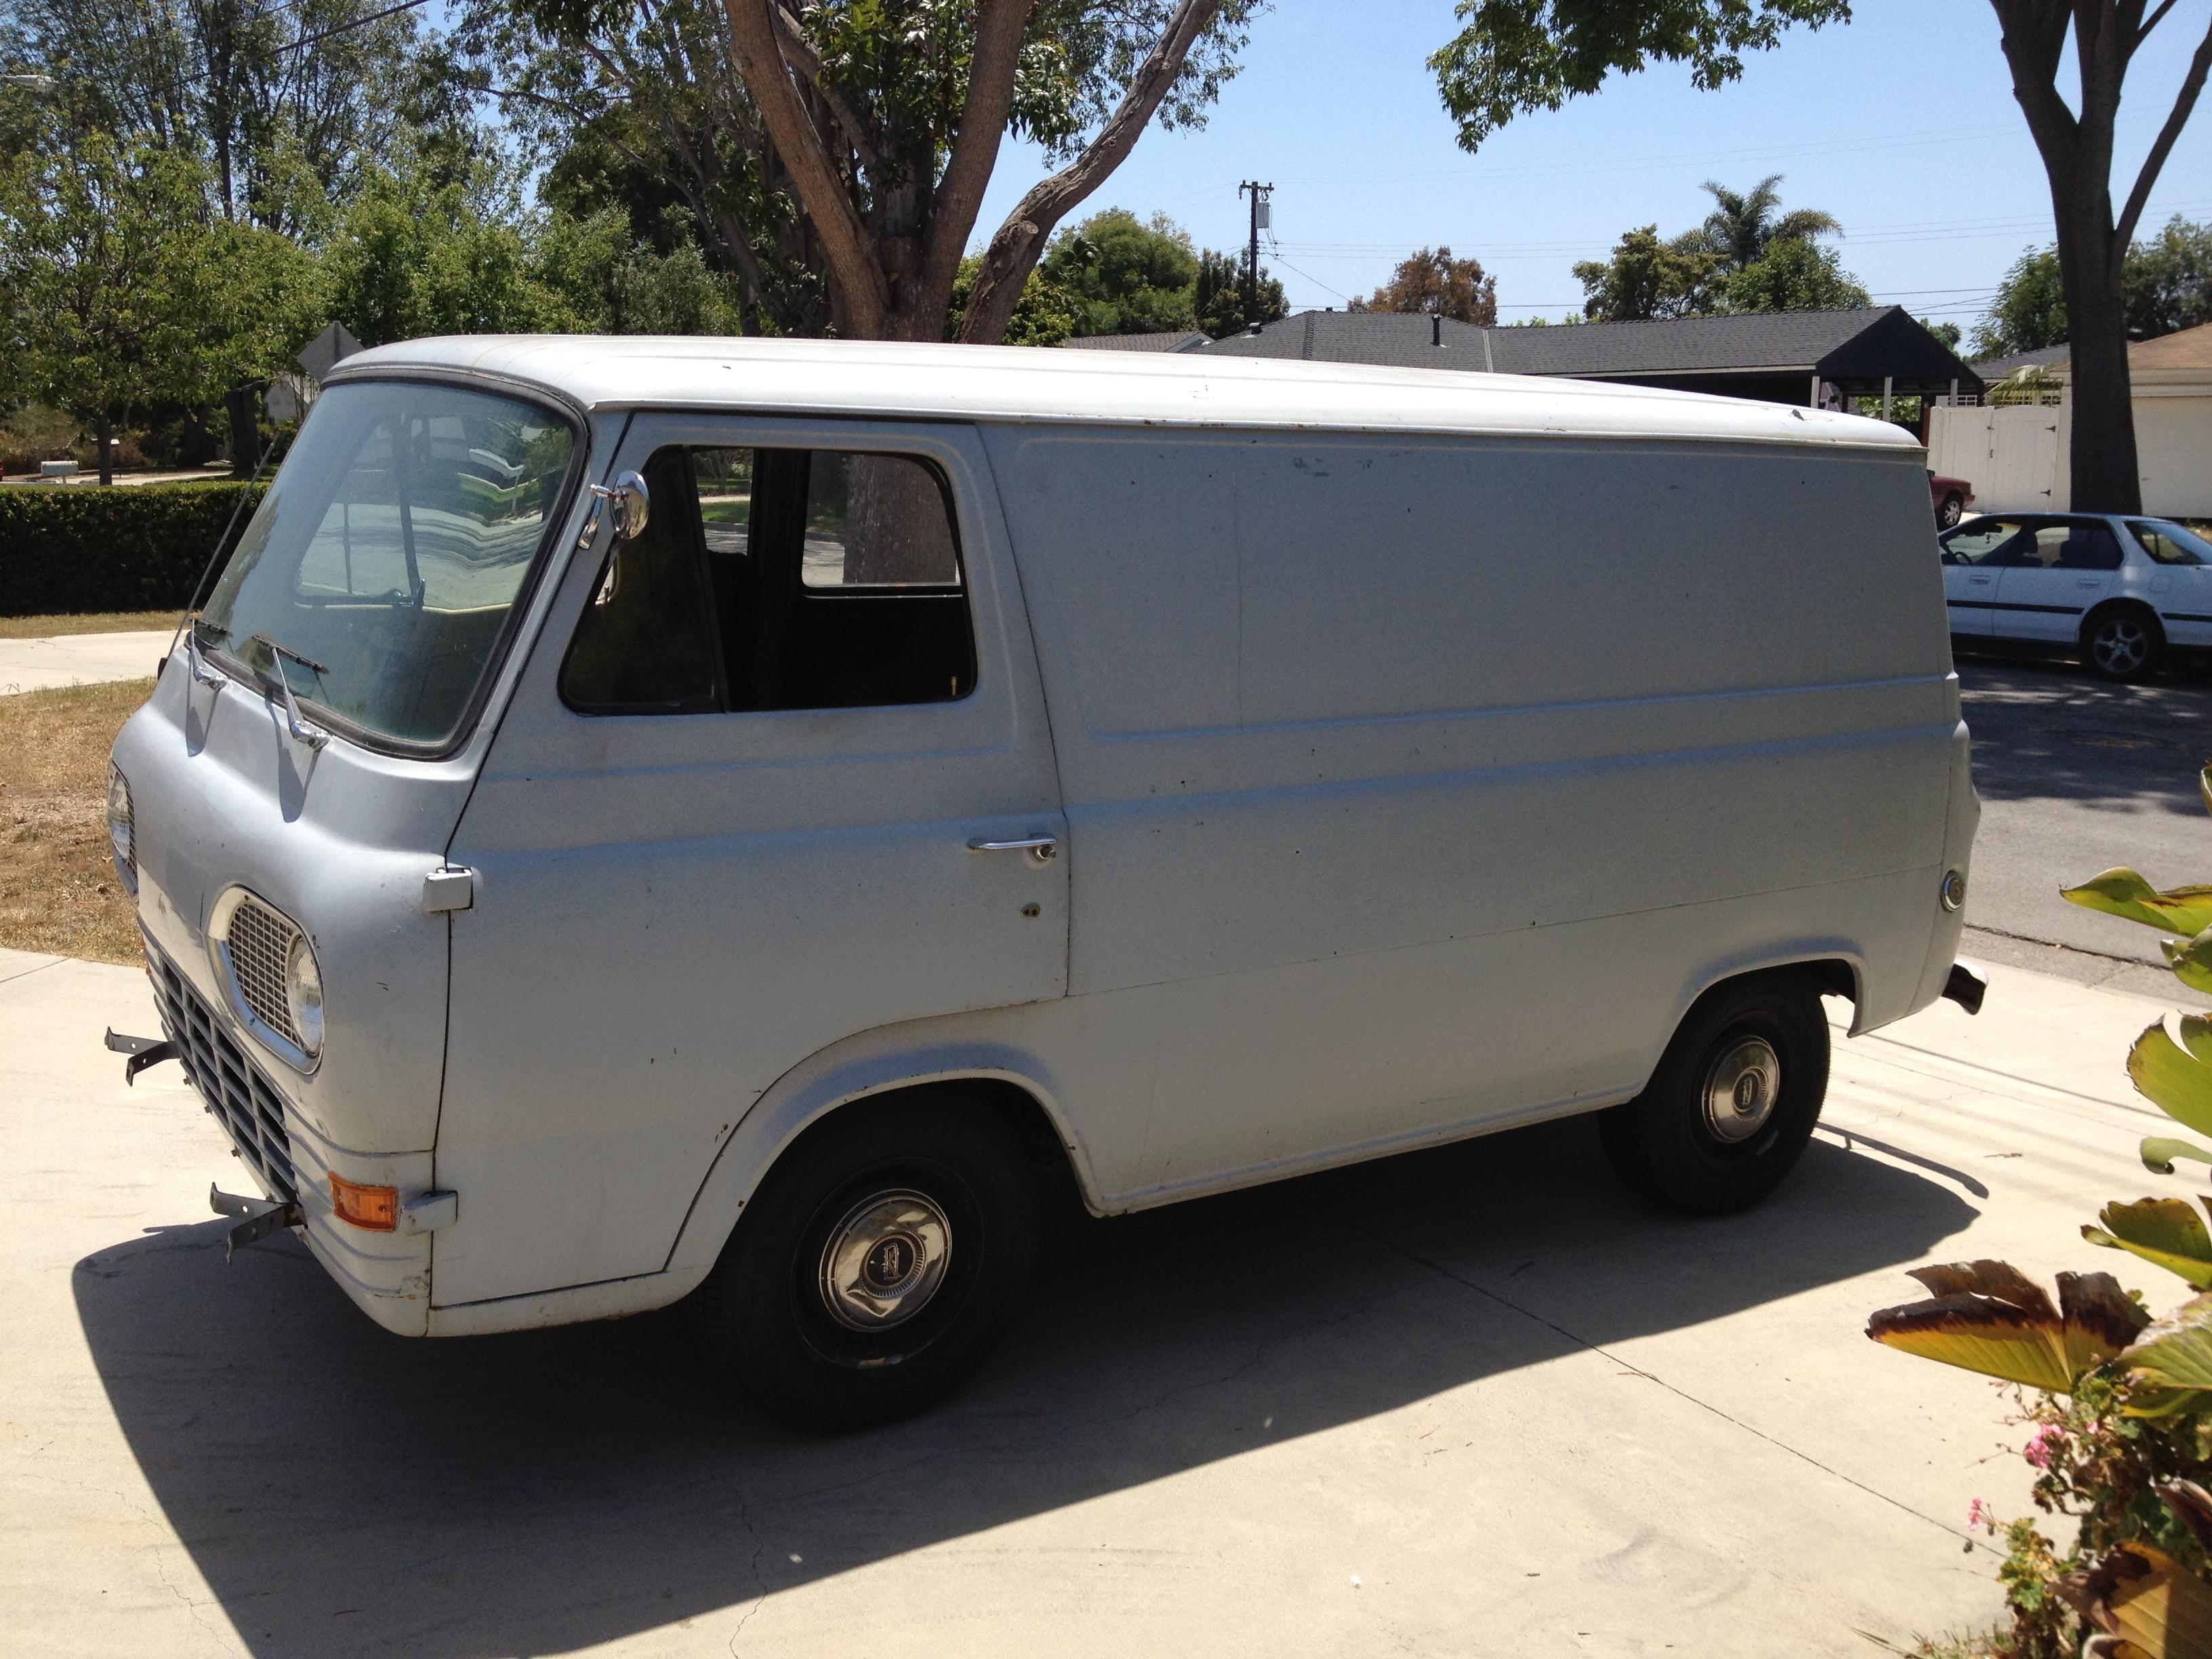 31b9e39a92 car van vehicle ford minibus econoline commercial vehicle land vehicle white  van automobile make microvan